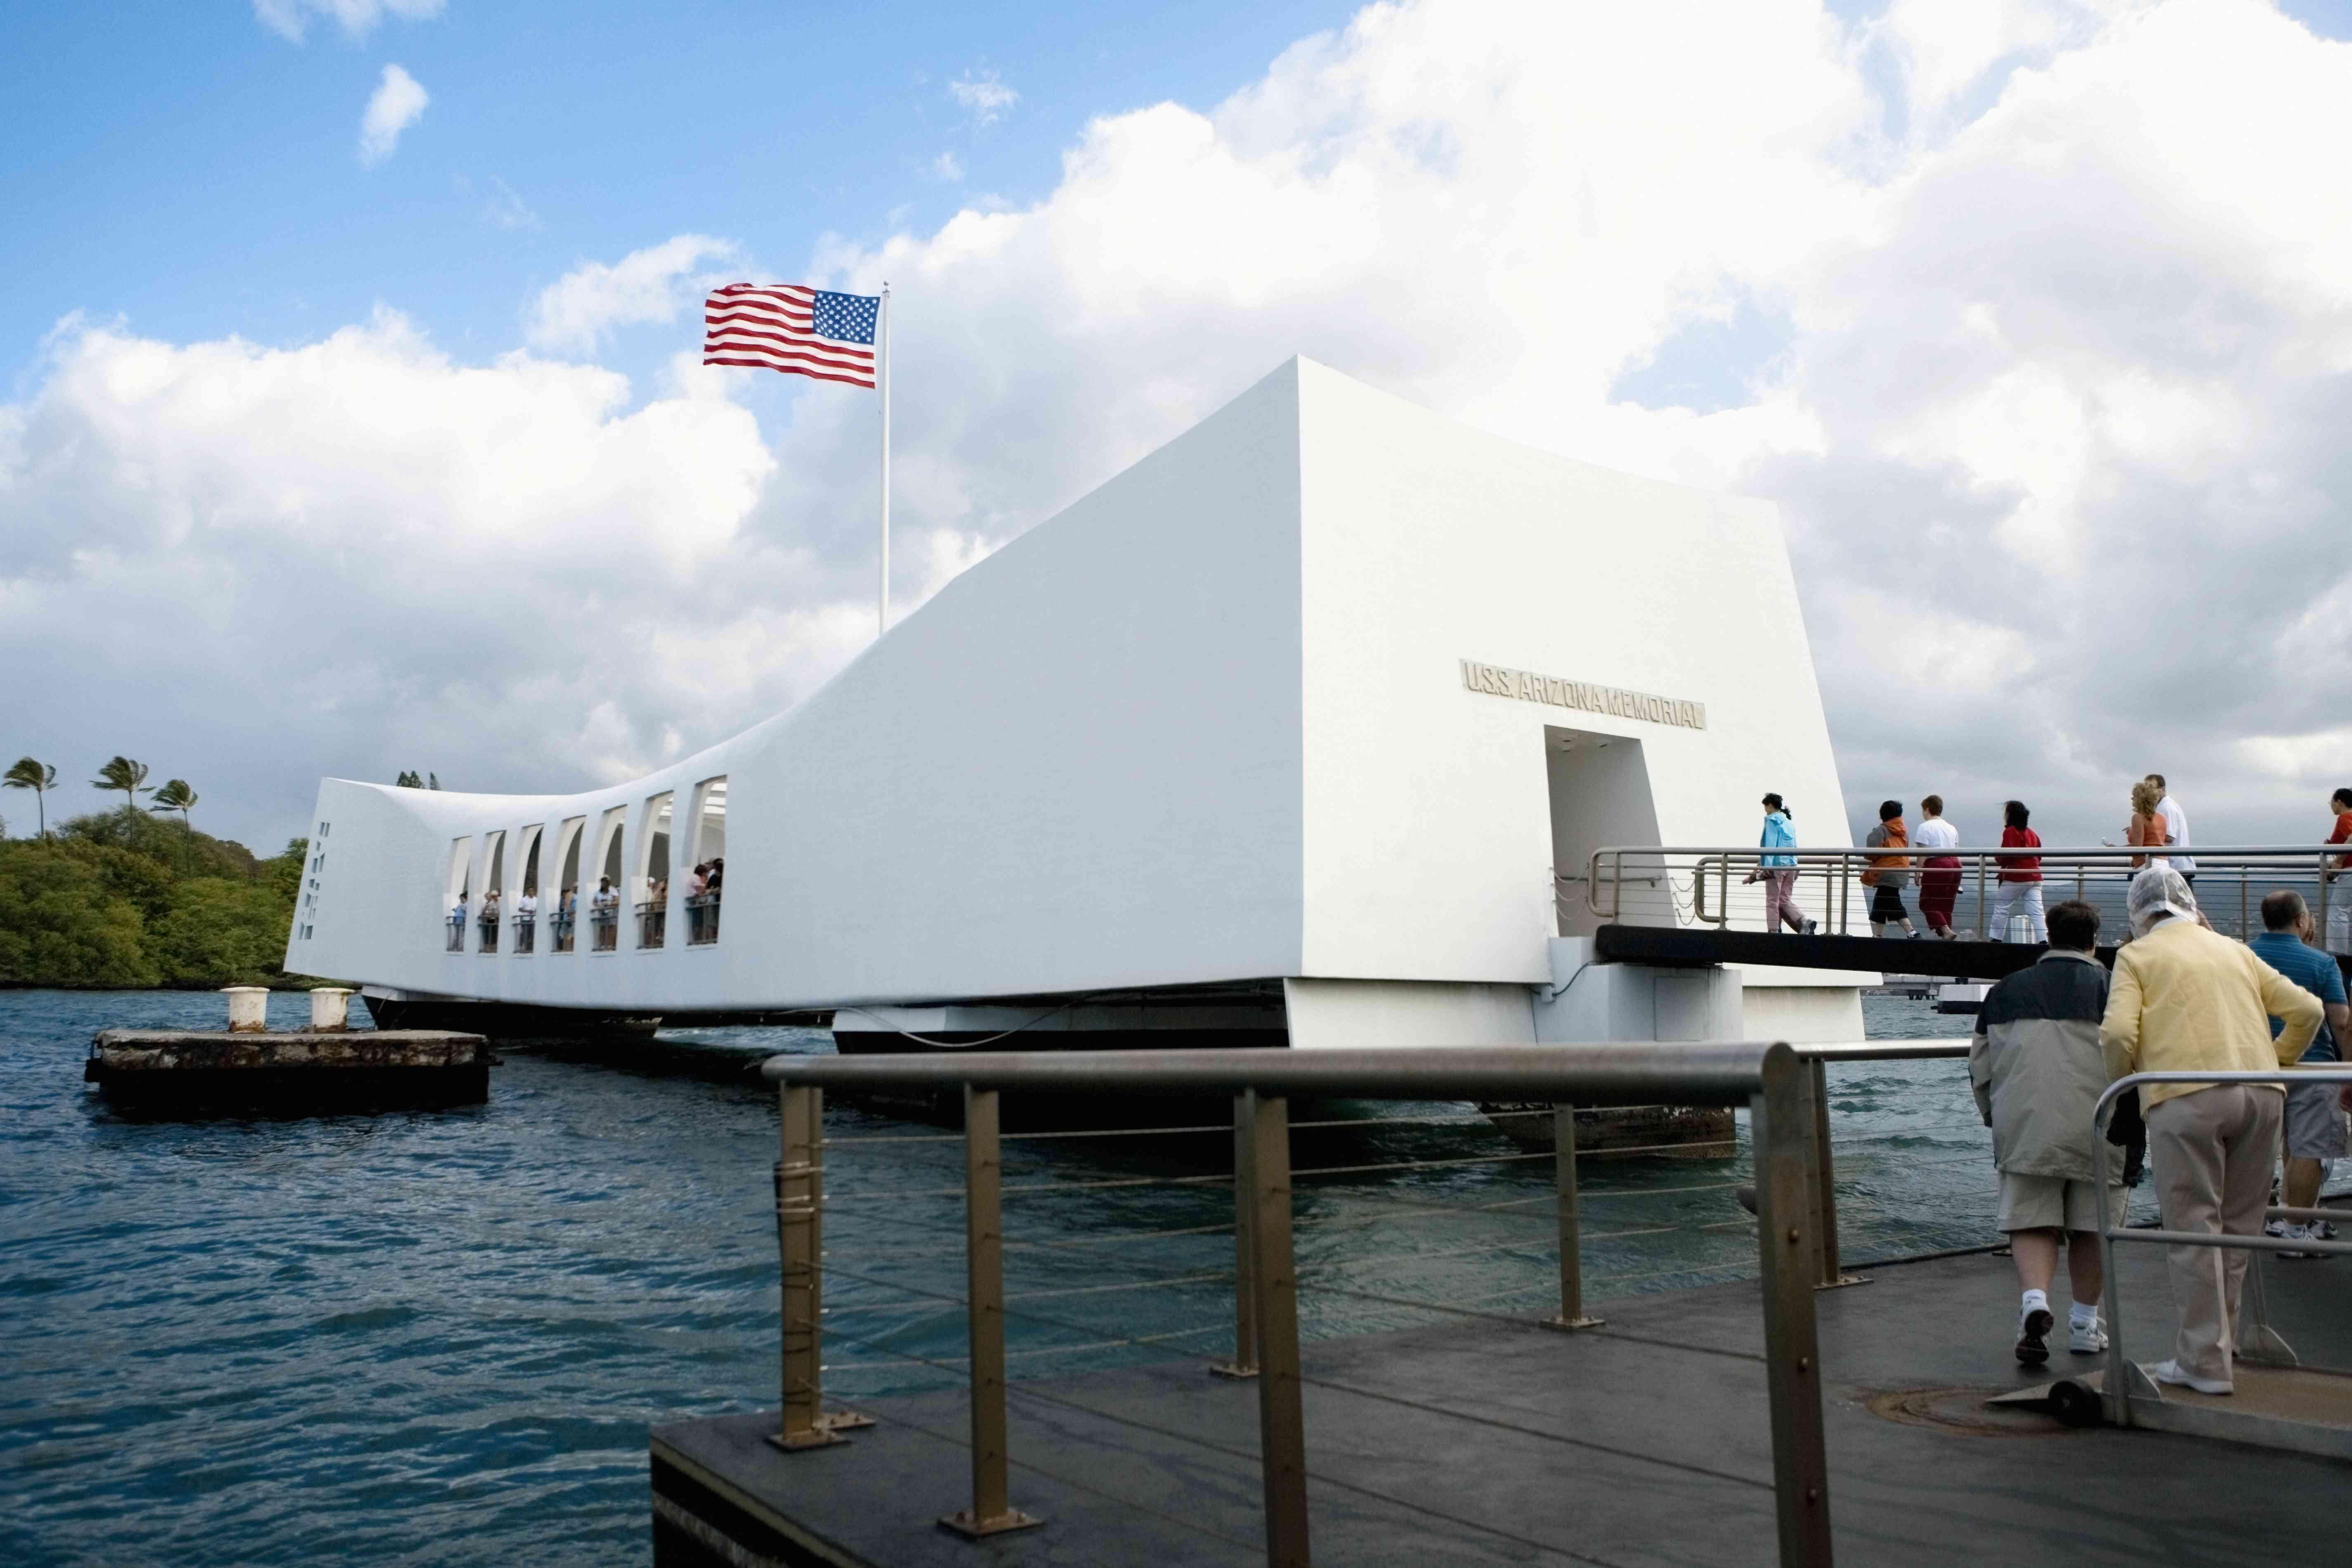 American flag fluttering on a memorial building, USS Arizona Memorial, Pearl Harbor, Honolulu, Oahu, Hawaii Islands, USA